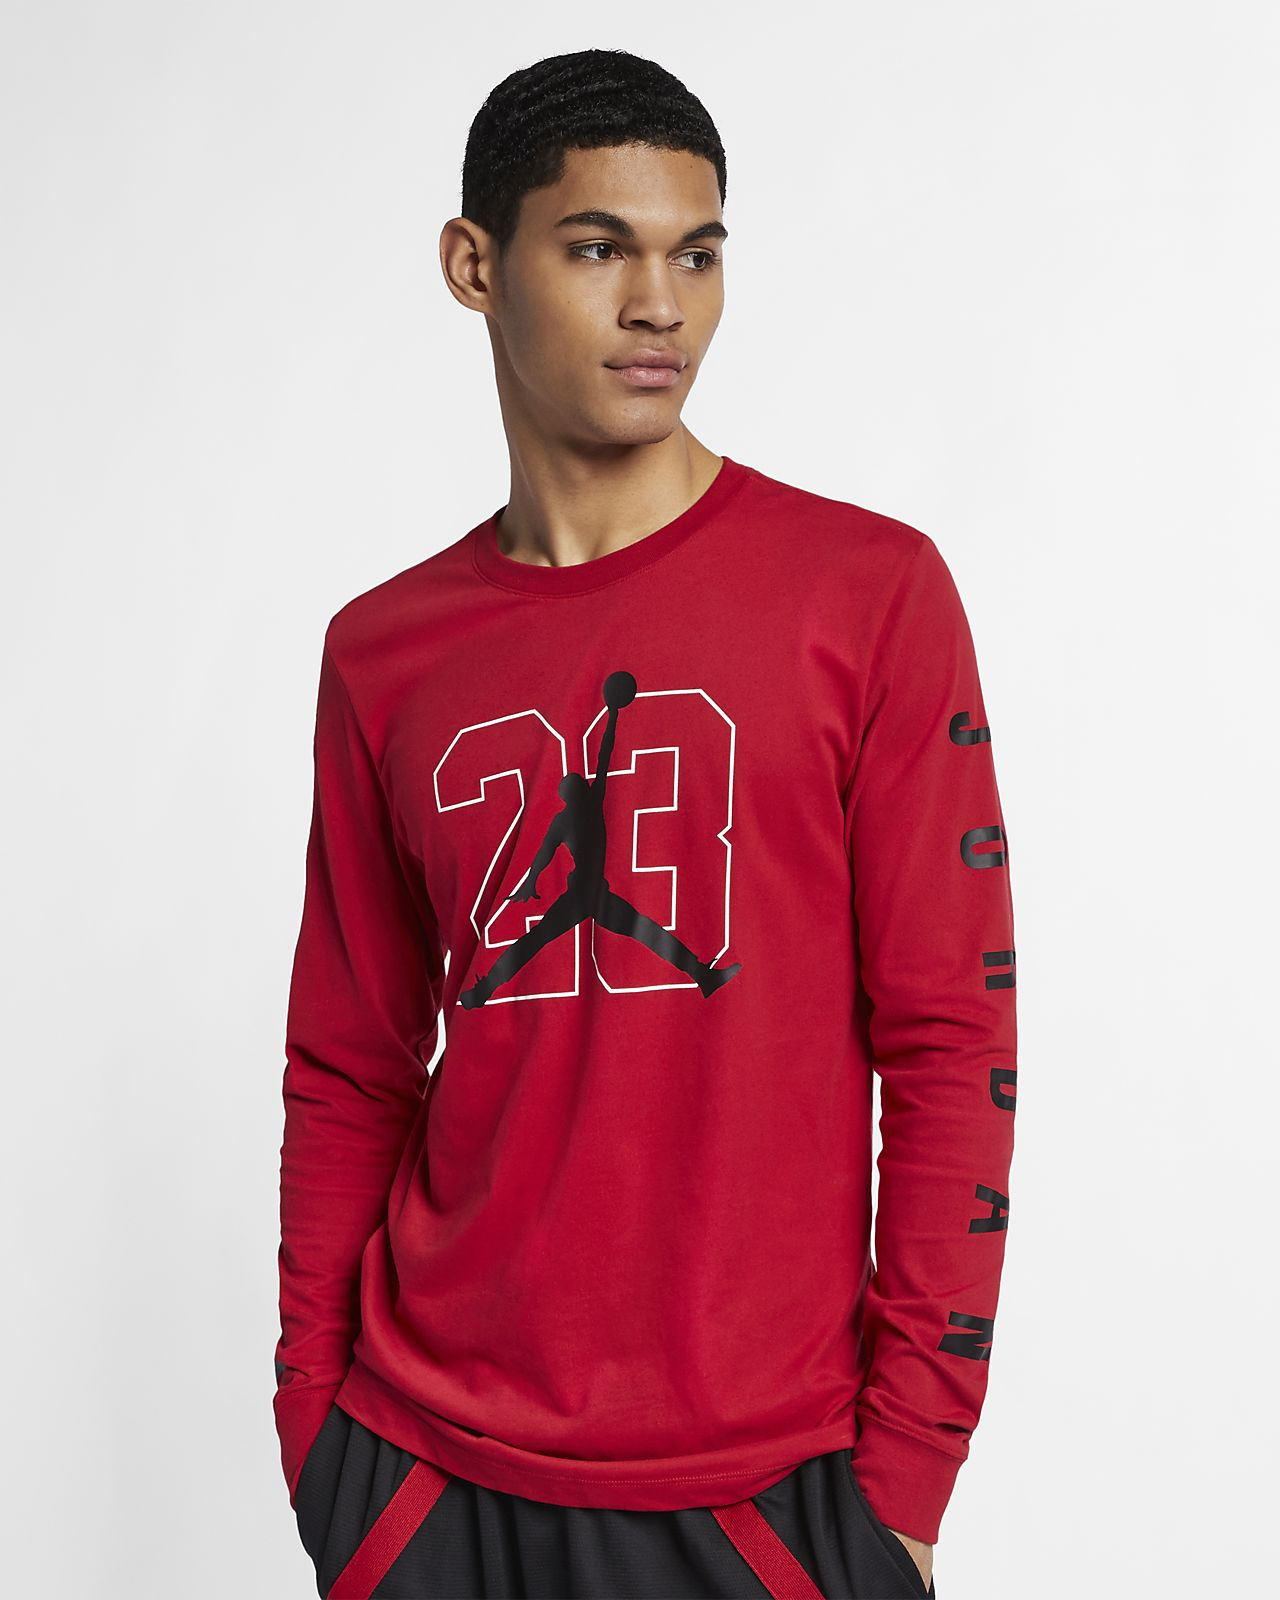 caa62dc22a66 Jordan Men s Graphic Long-Sleeve Basketball T-Shirt. Nike.com